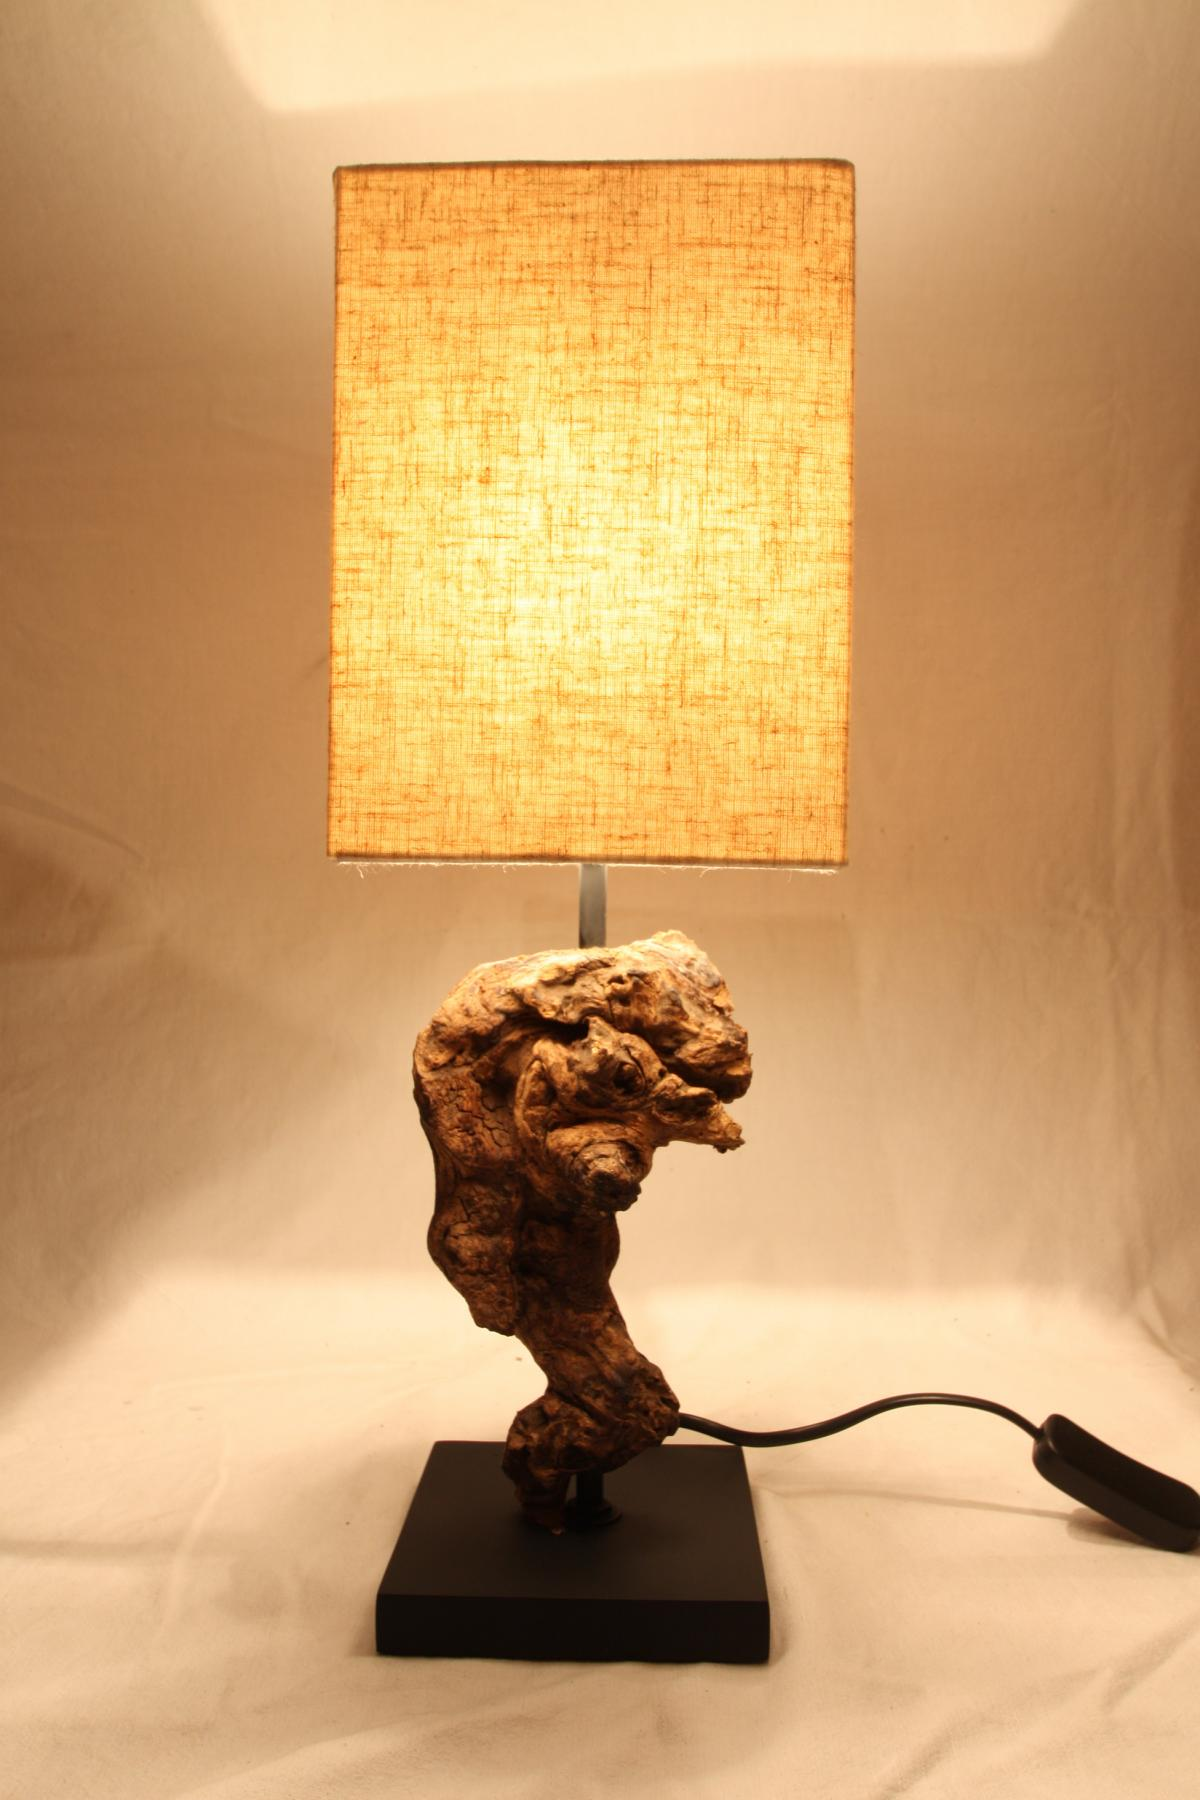 Treibholz Lampe Decke : einmalige treibholz lampen schwemmholz lampen ~ Frokenaadalensverden.com Haus und Dekorationen